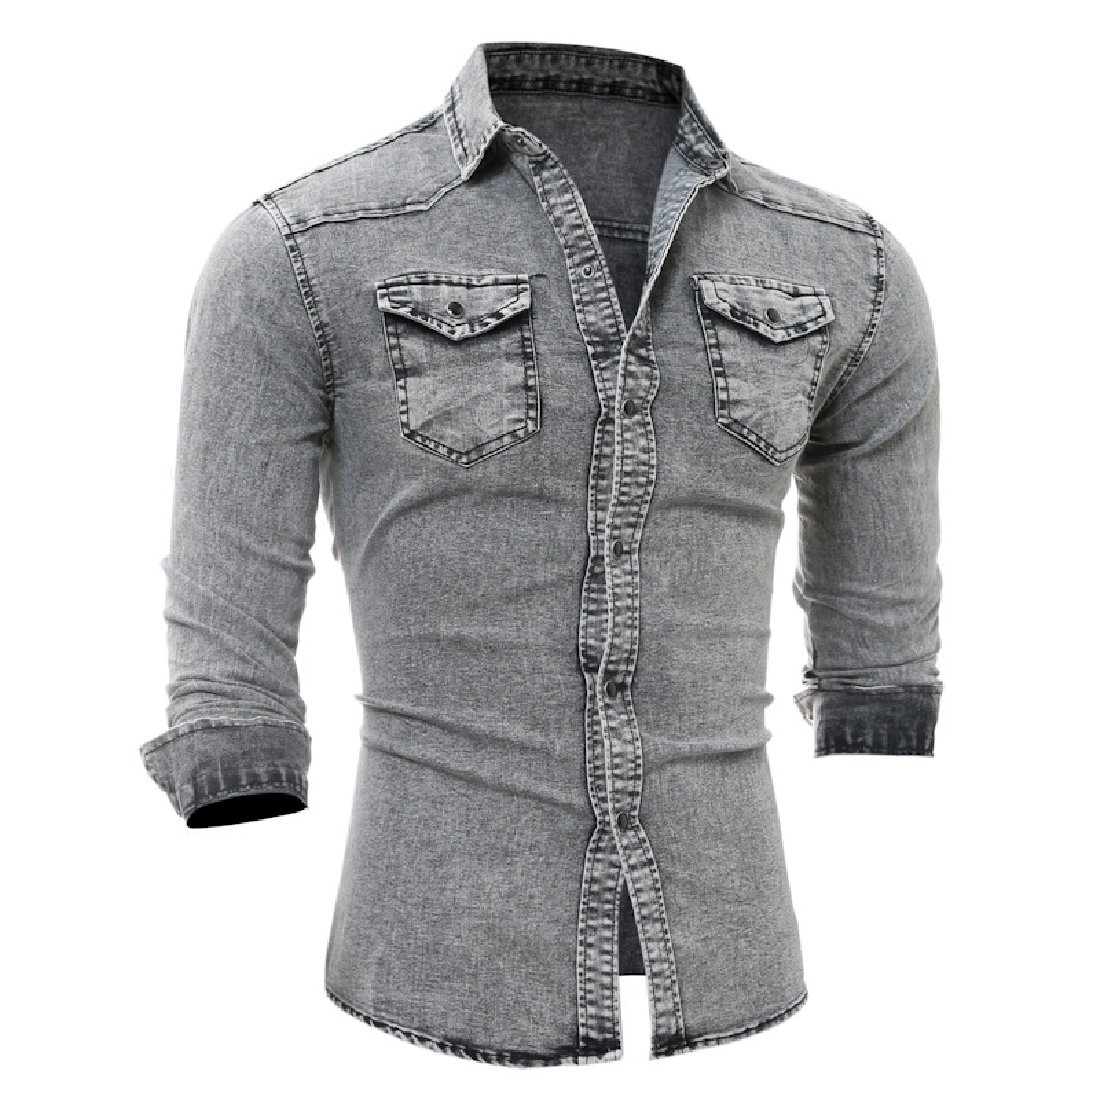 YUNY Mens Turndown Collar Denim Business Long Sleeve Pocket Caftan Casual Shirt Light Grey S